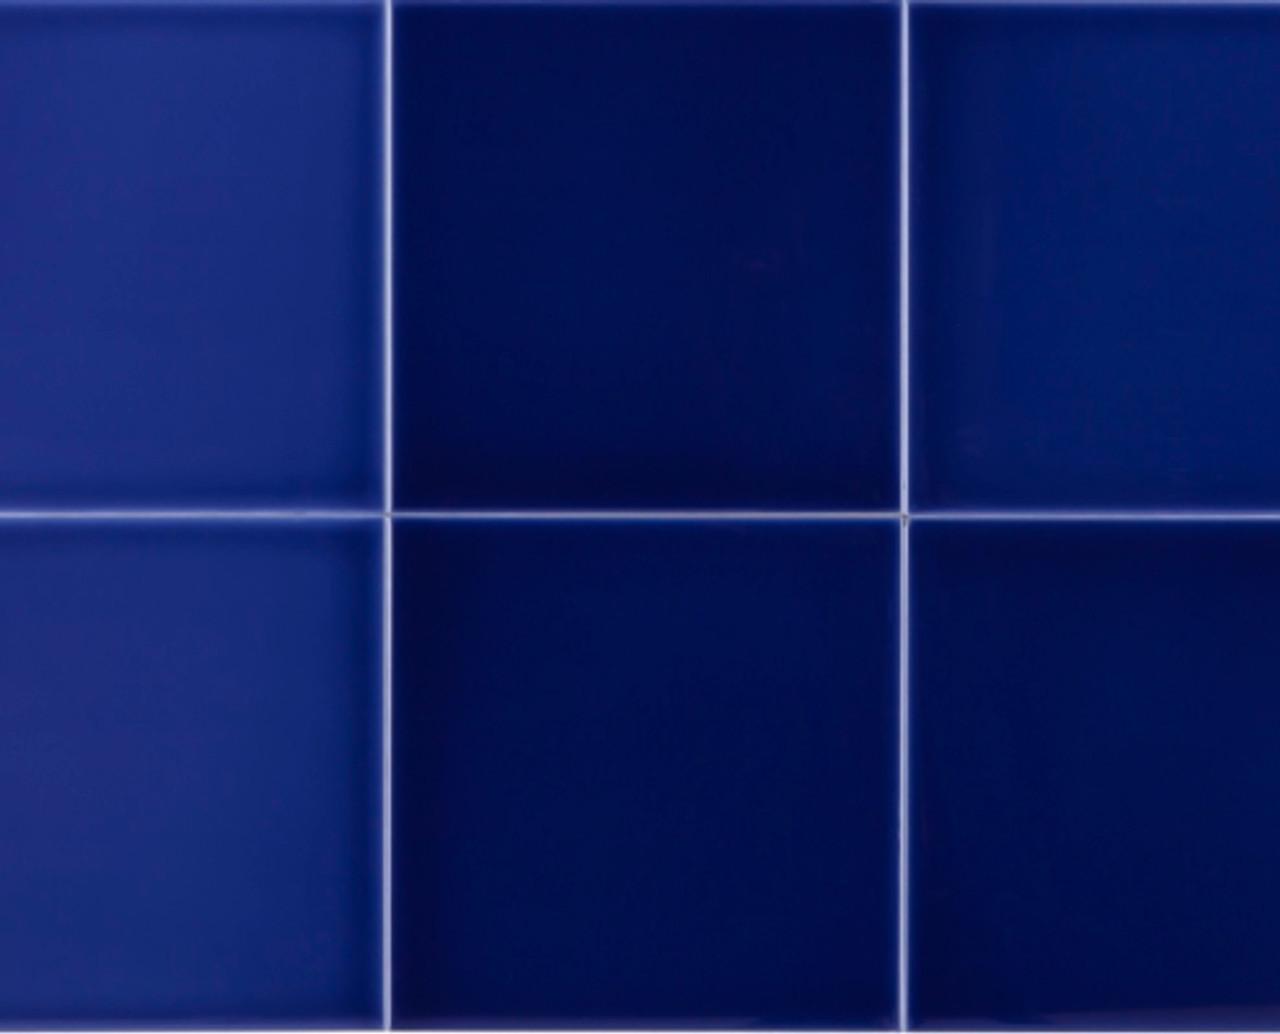 riviera santorini blue 8x8 field tile